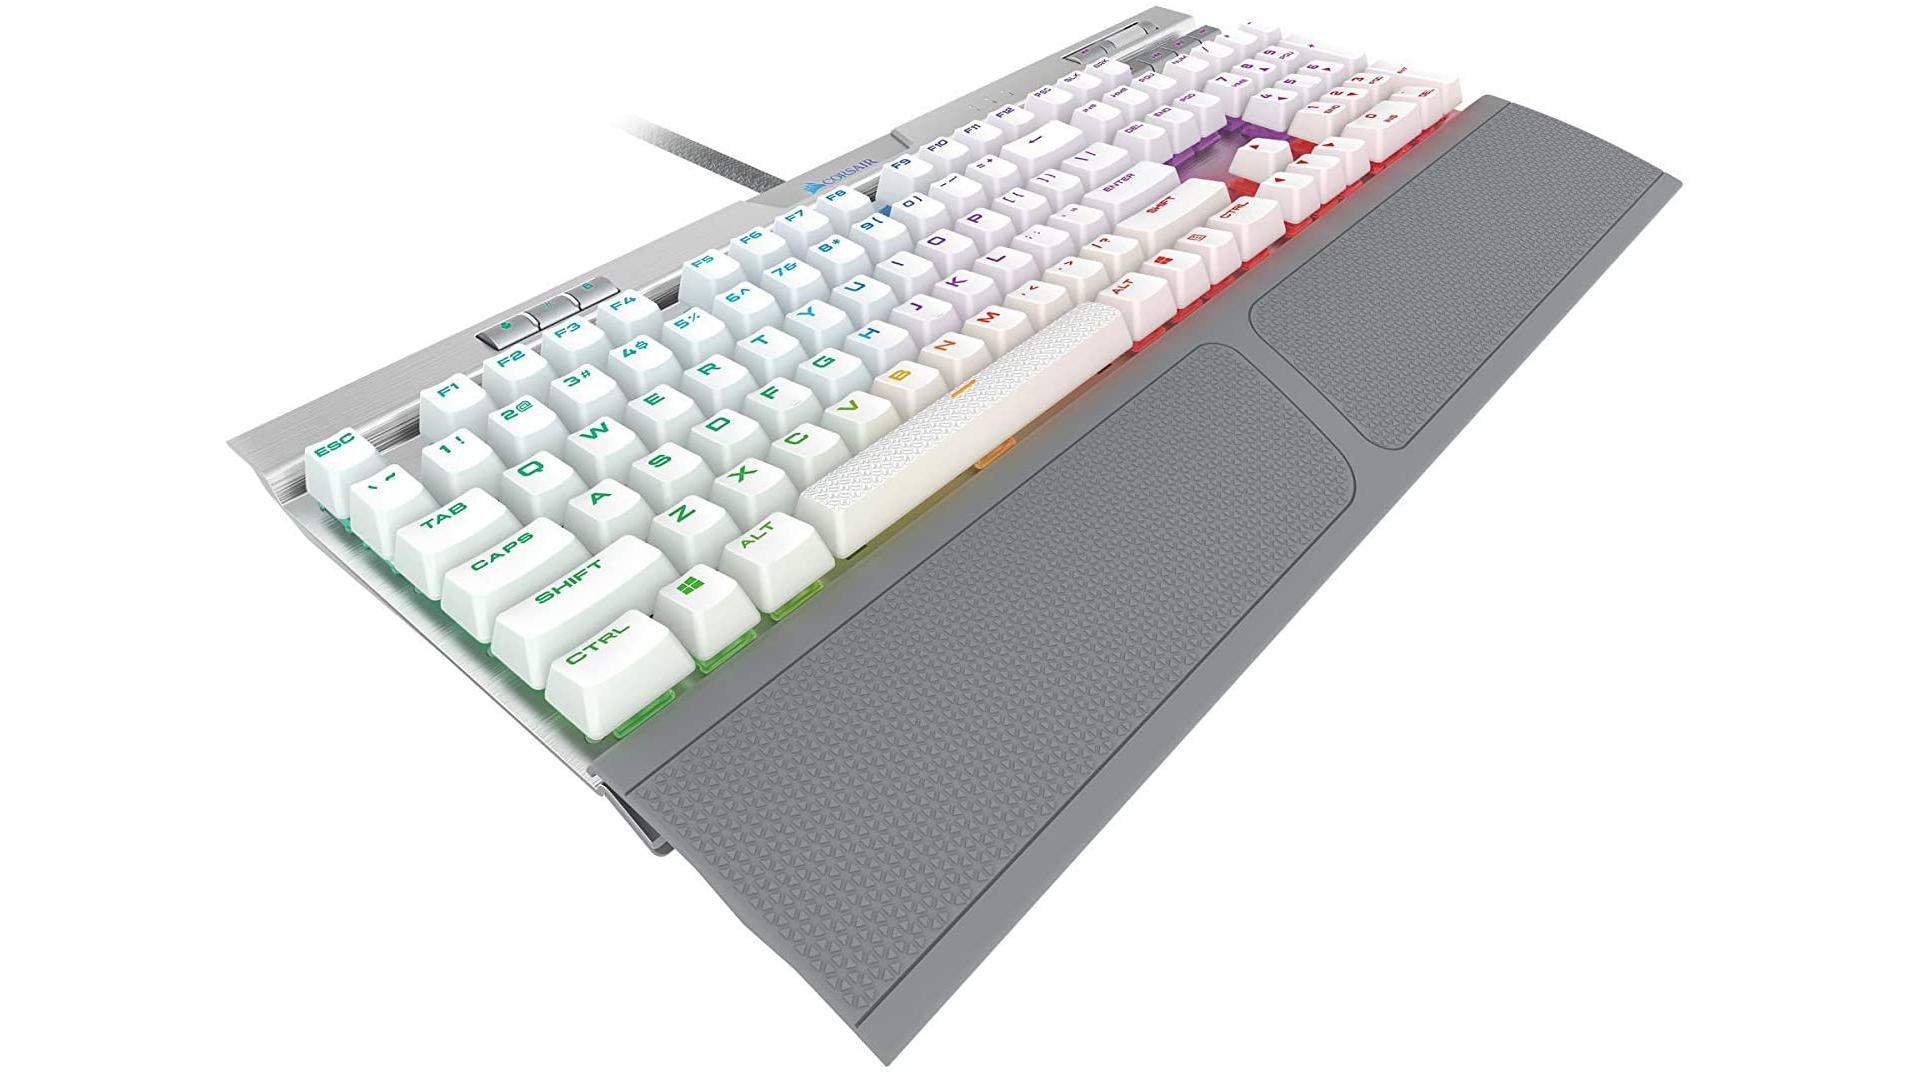 Corsair K720 Keyboard